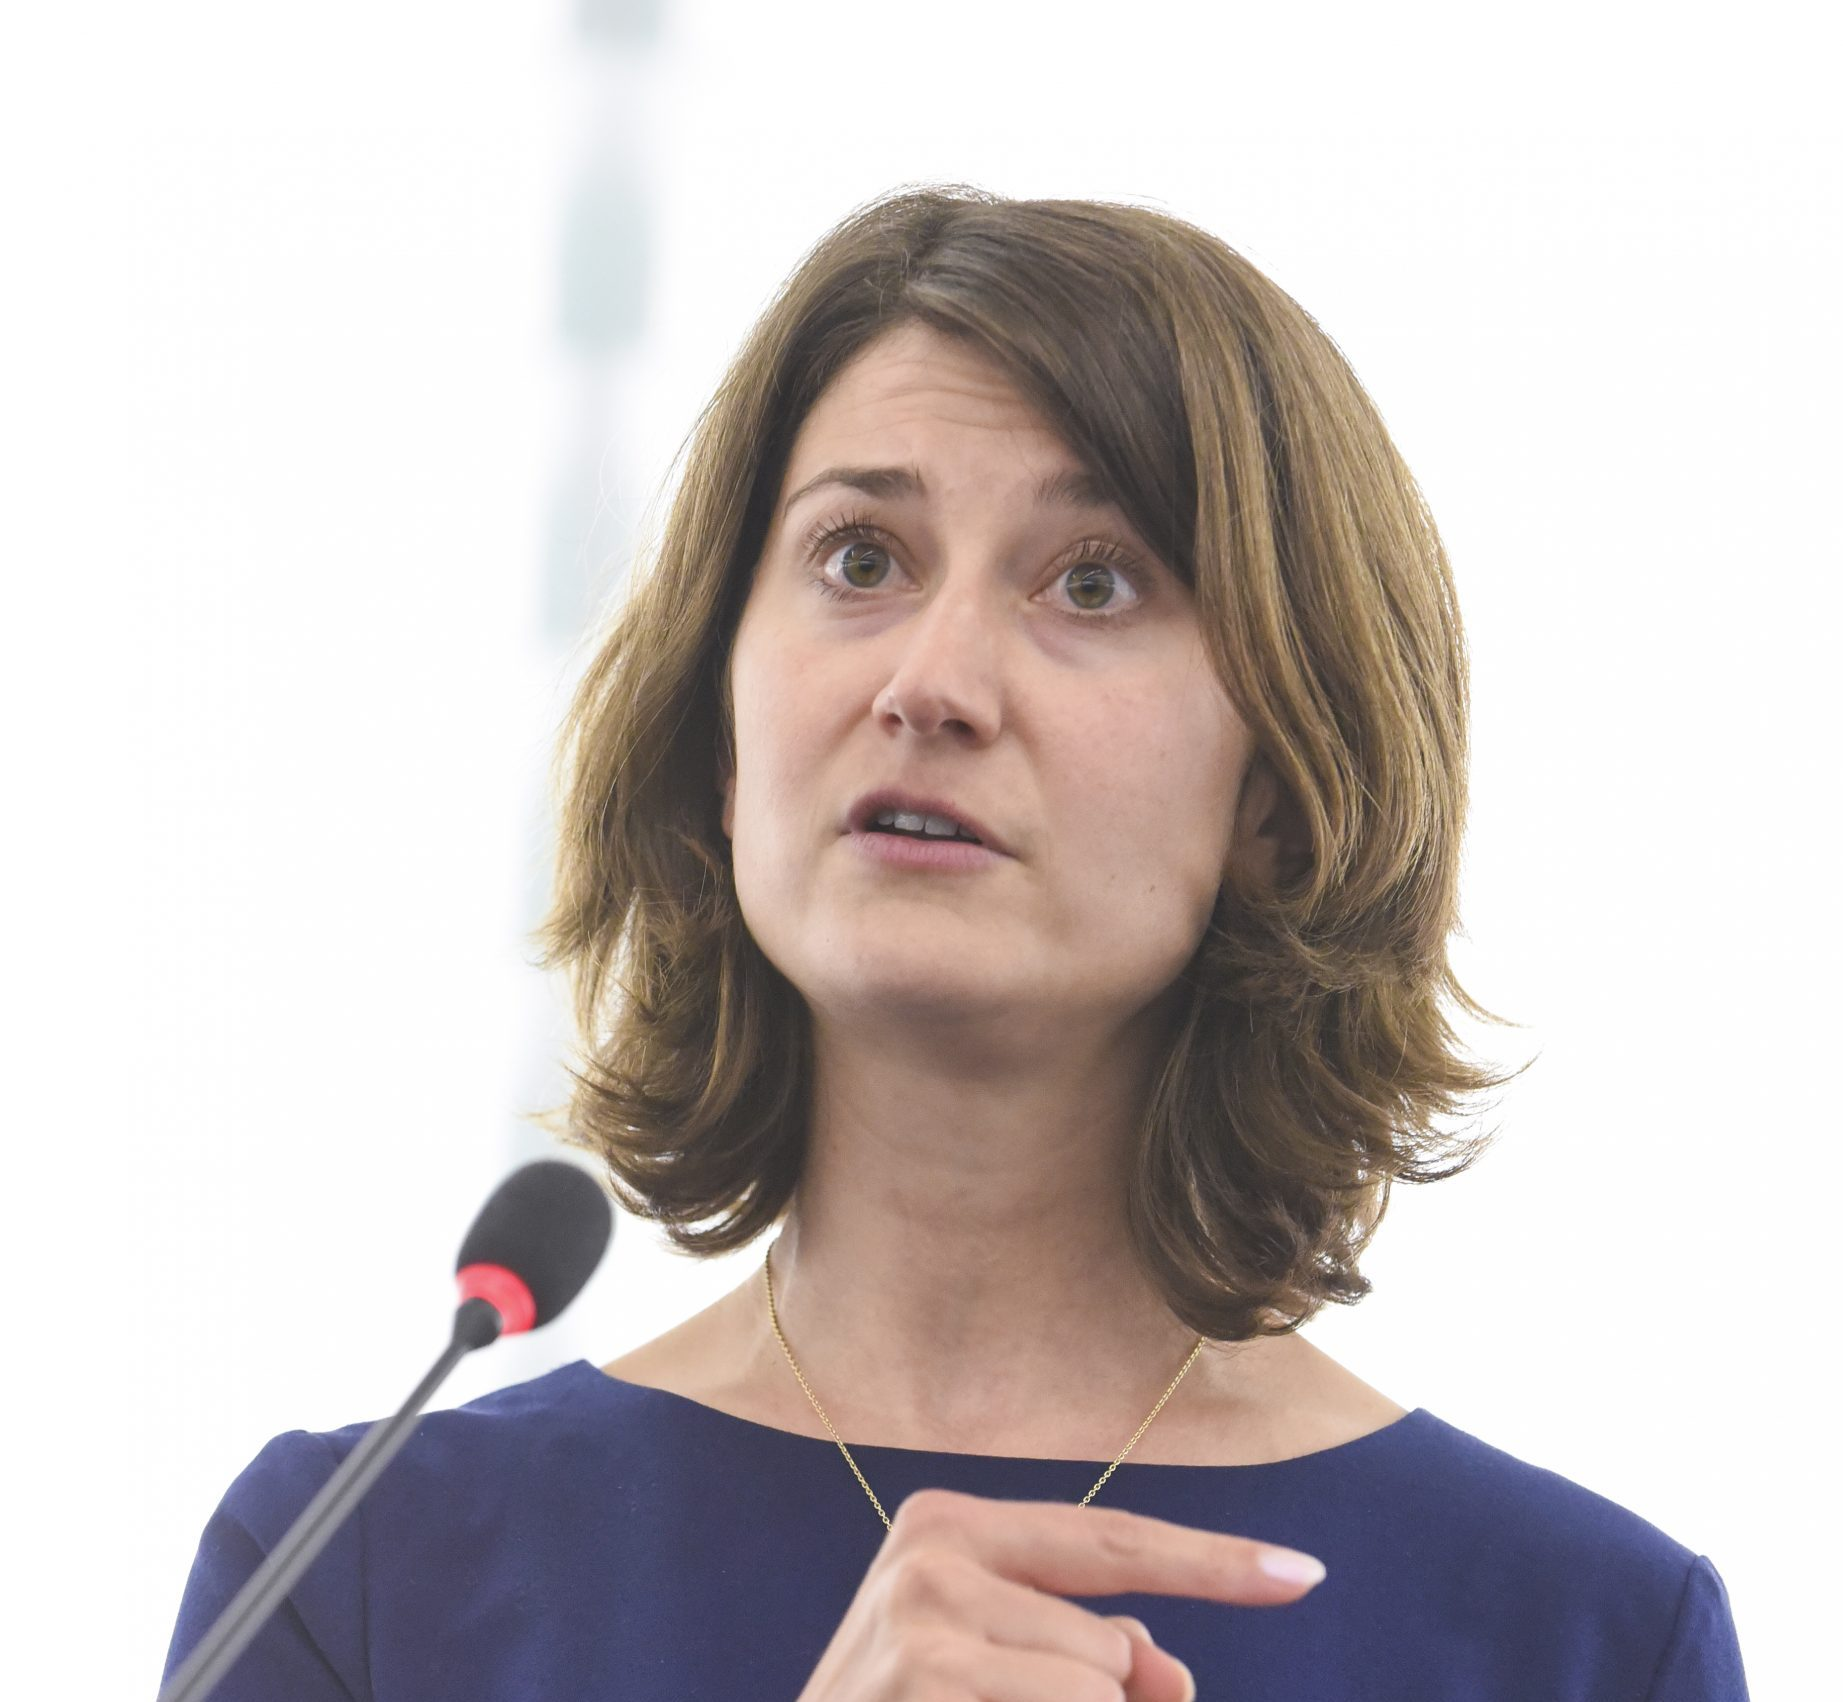 Lara WOLTERS